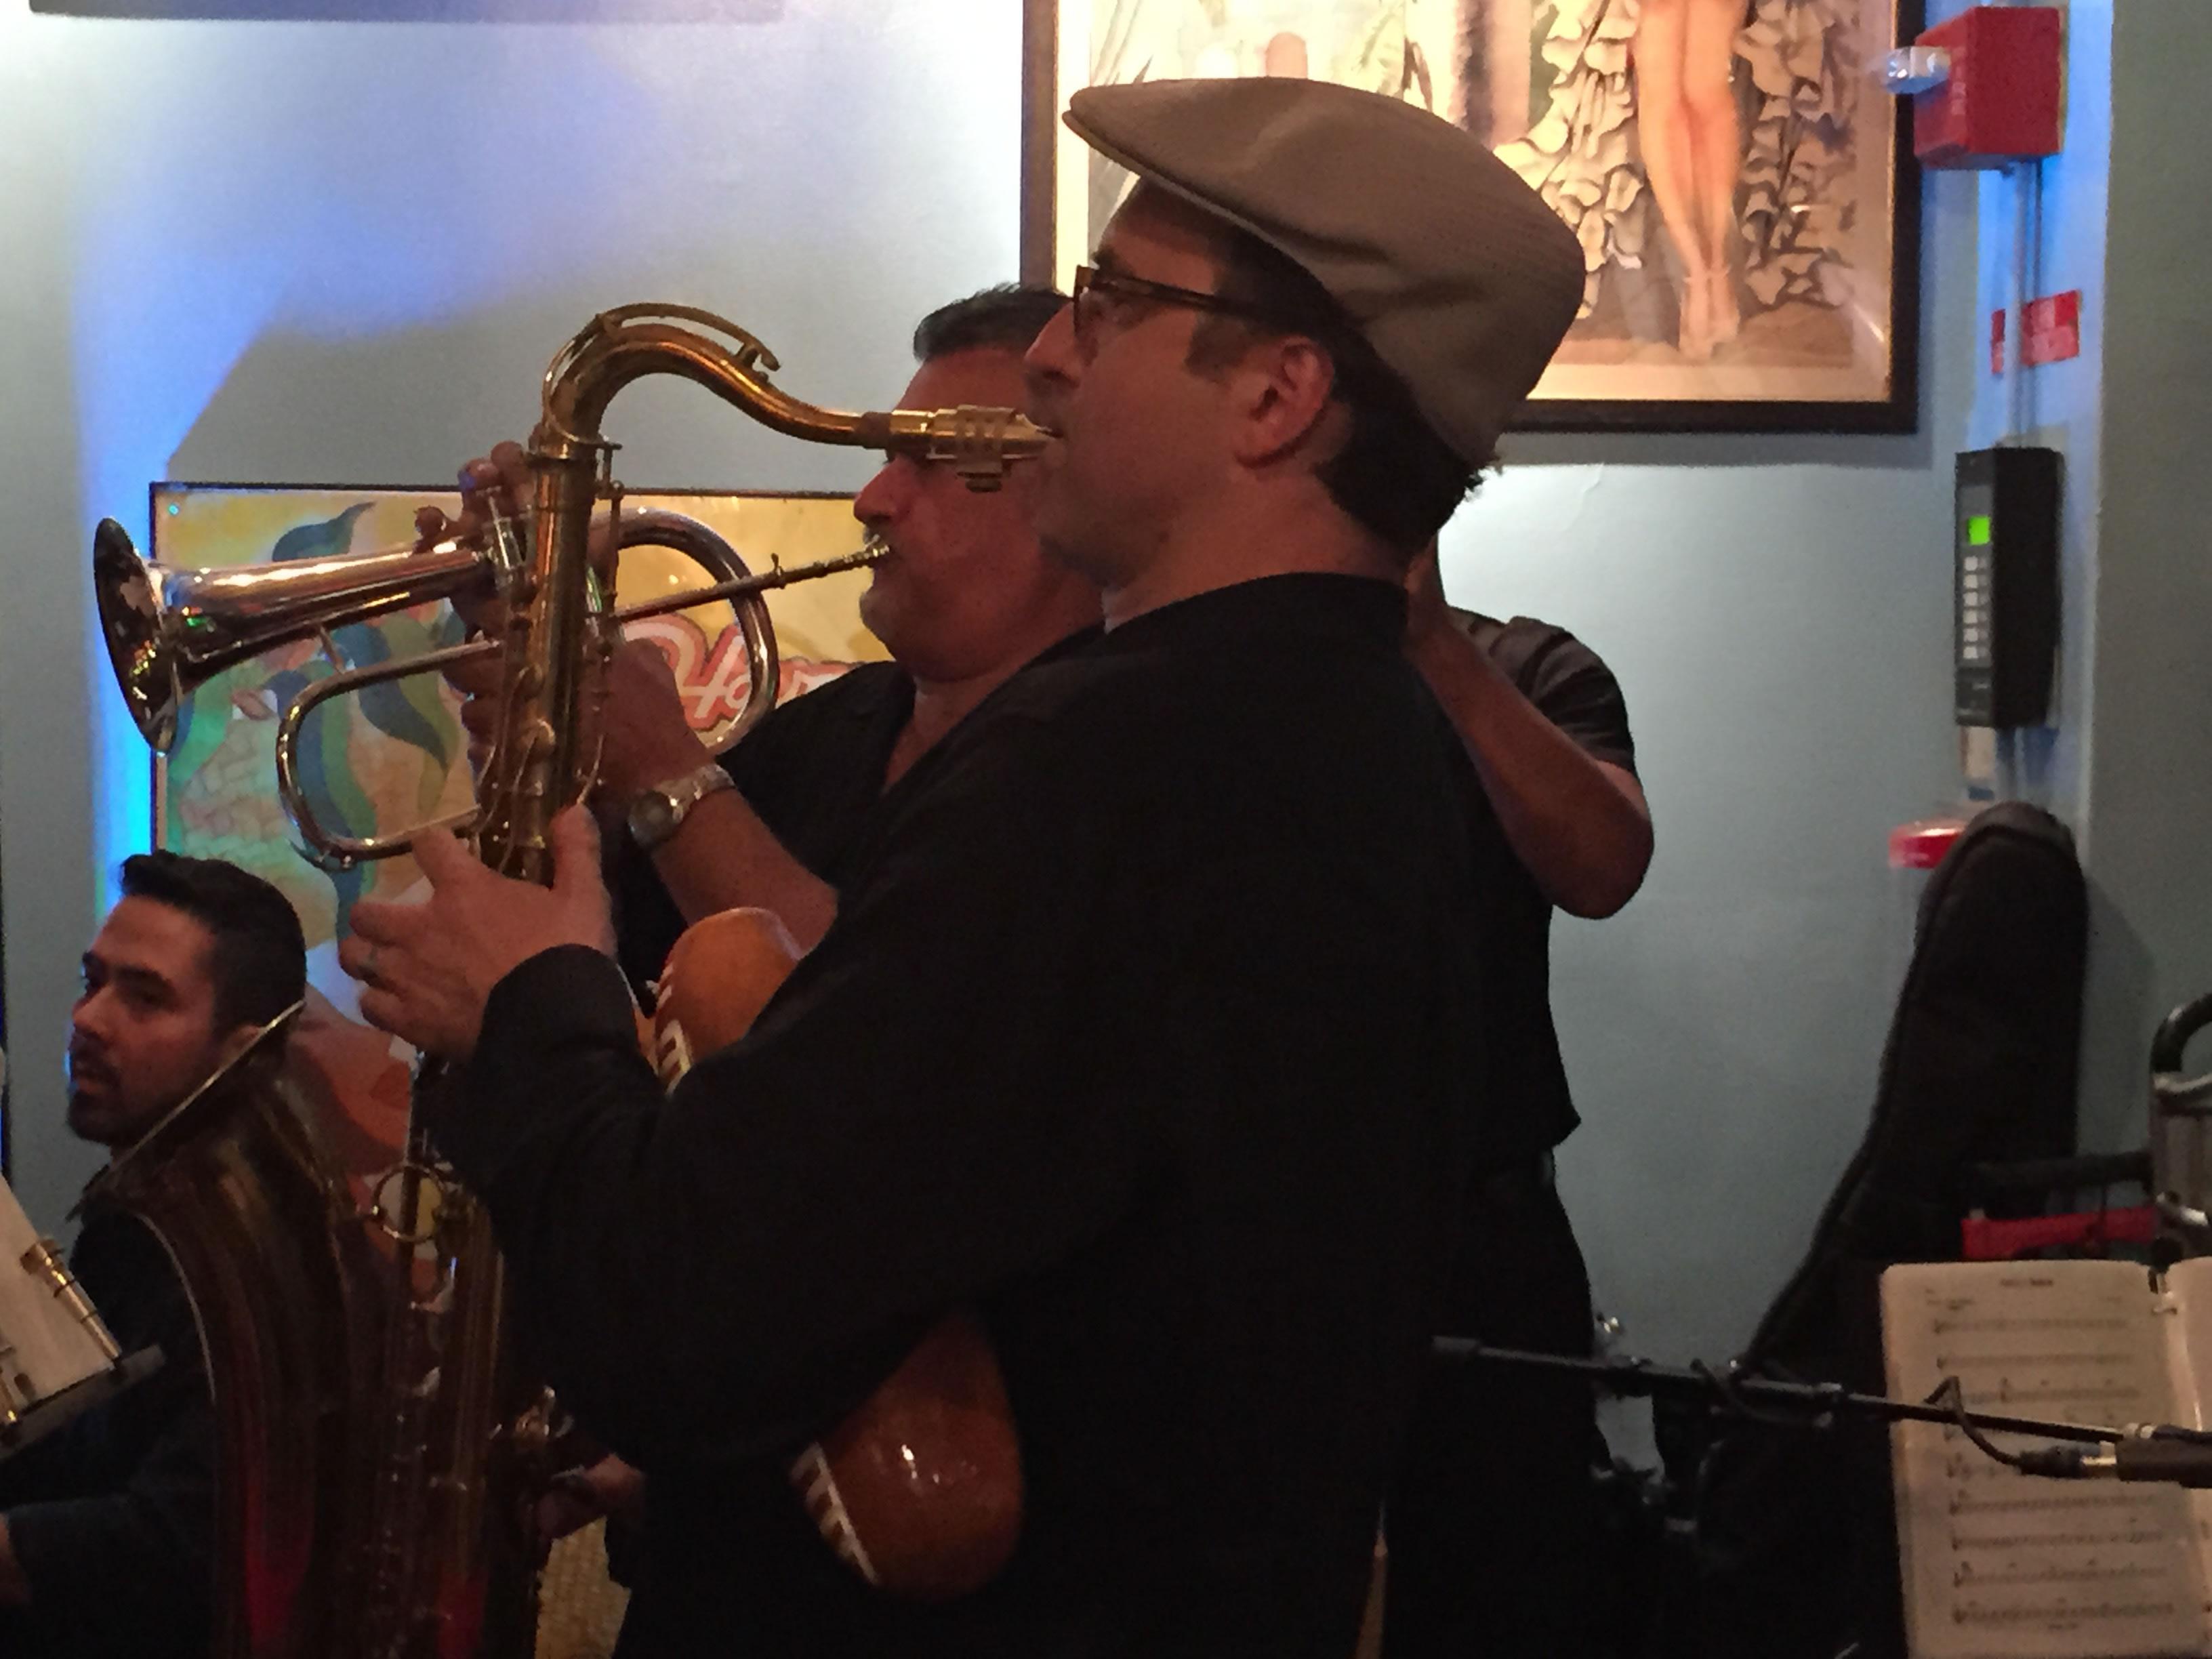 Saxophone-Trumpet-shot-Havana-Centra-Times-Square-restaurant